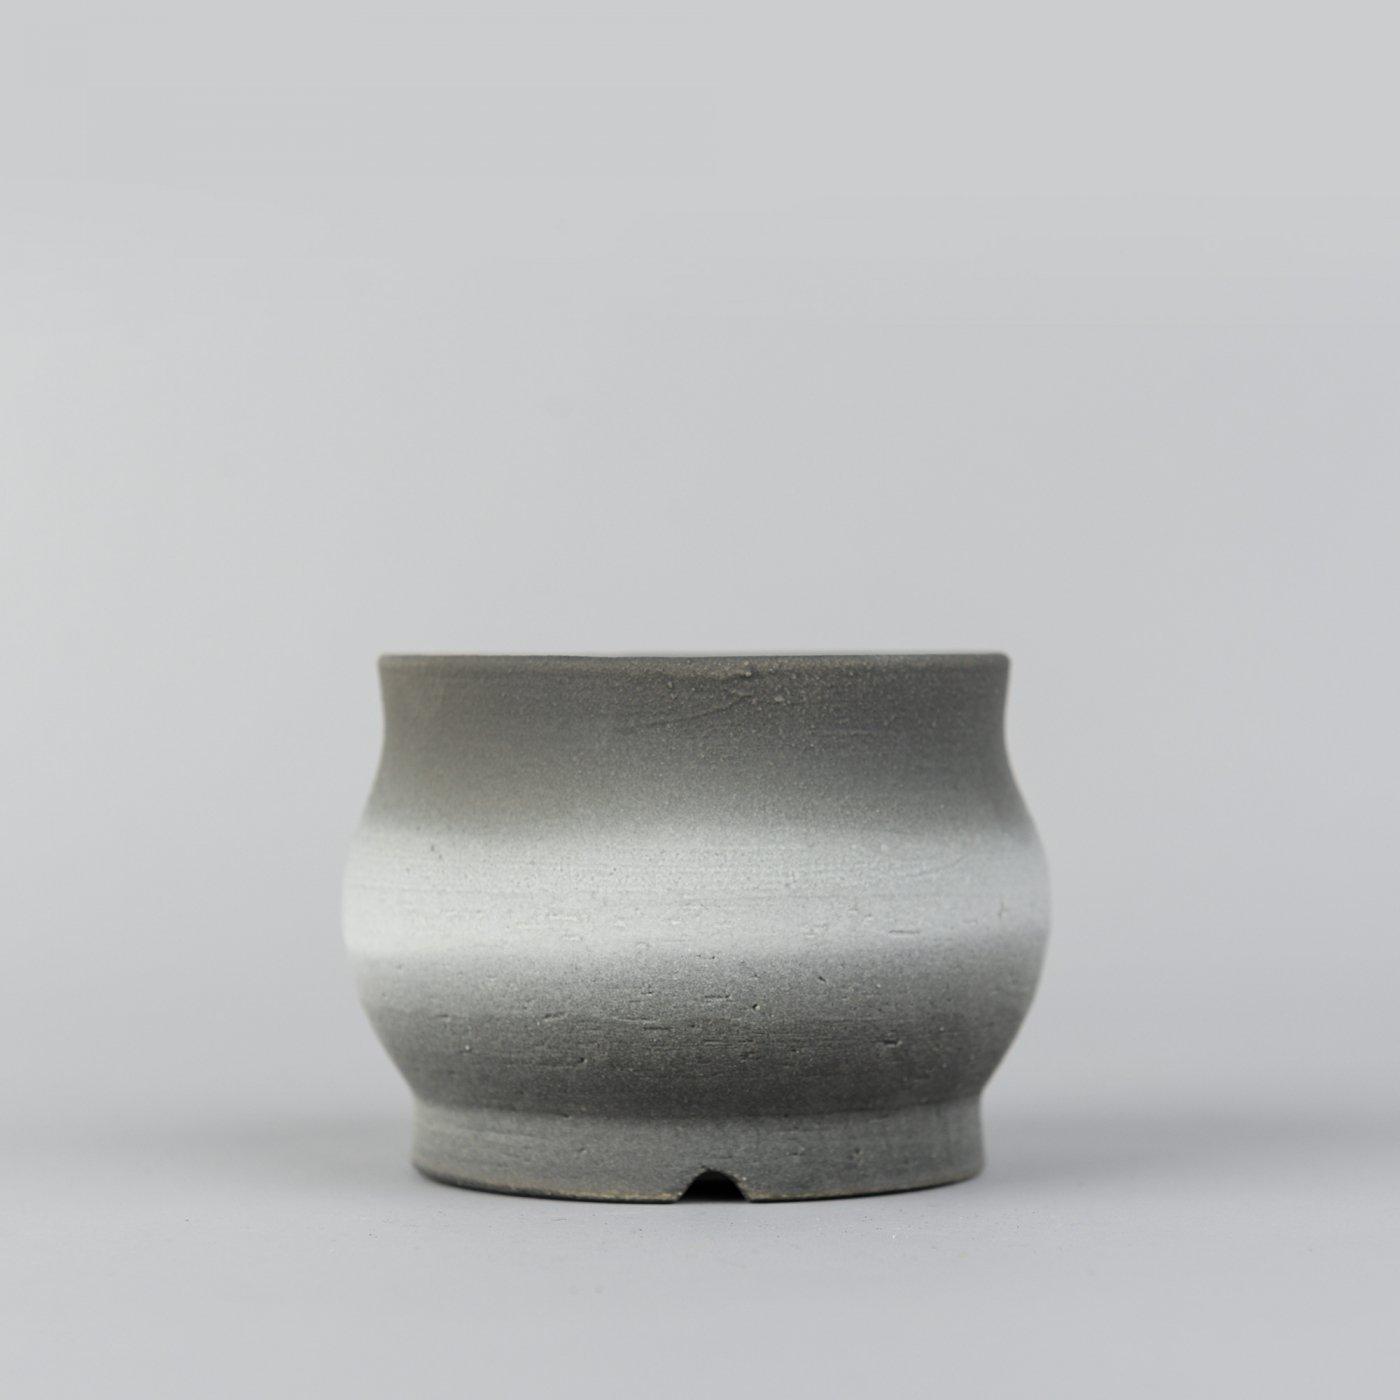 [Yoko Nishida] Curved pot monochrome